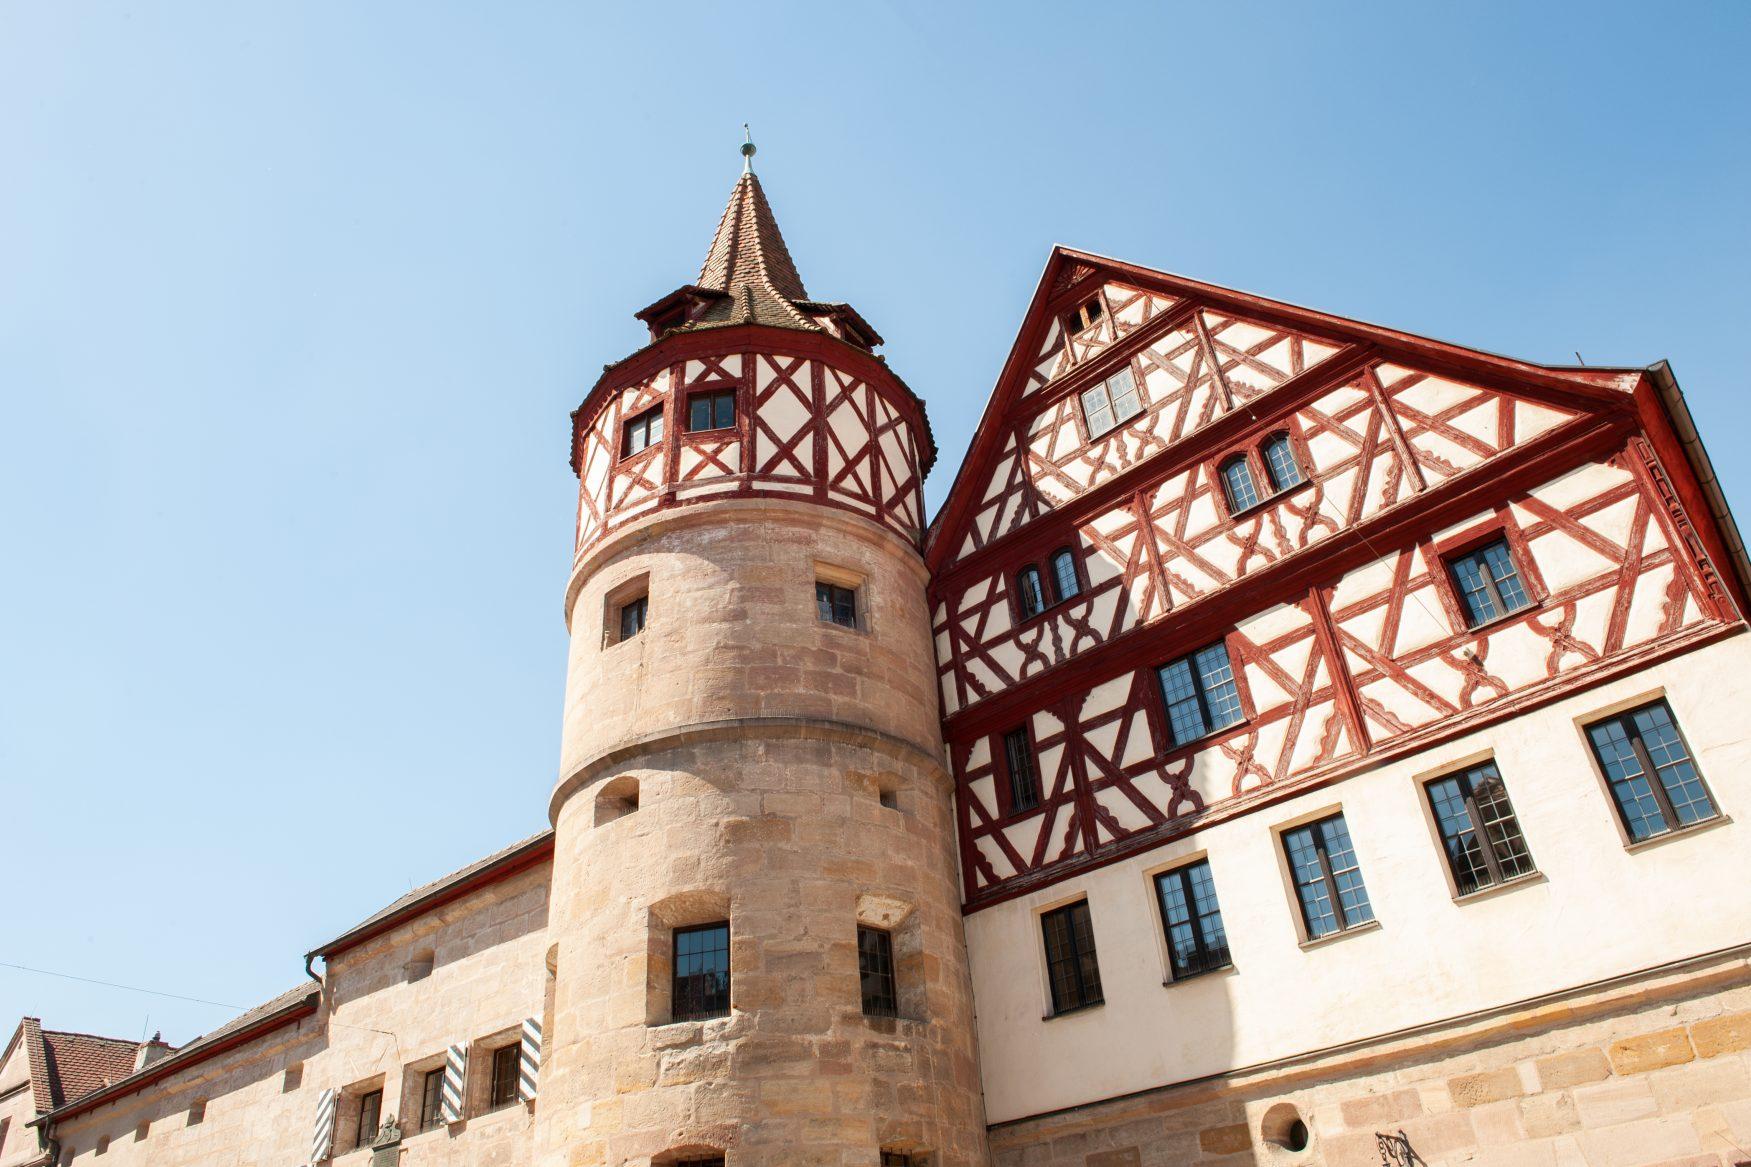 Blick auf Schloss Ratibor in Roth, Foto: Stadt Roth - Tourist-Information